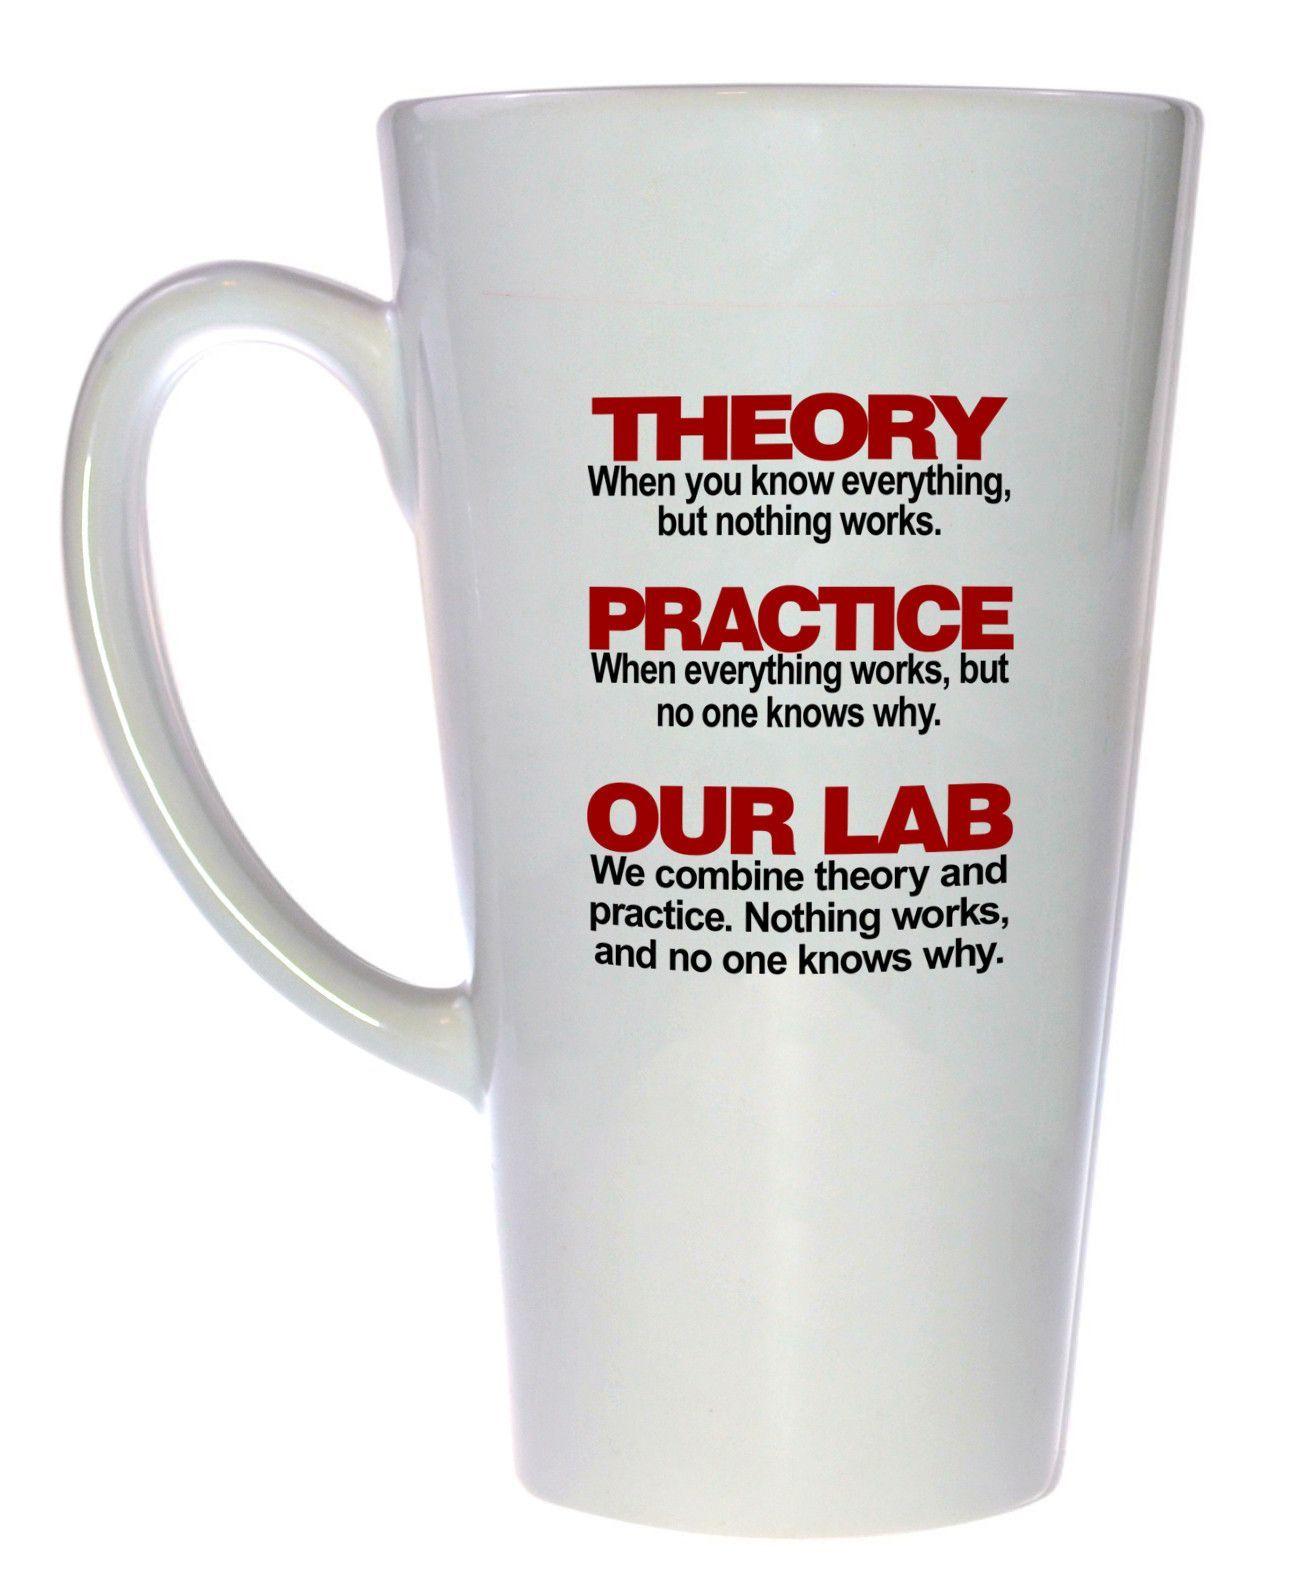 Theory and Practice Coffee or Tea Mug 17oz Tall Latte